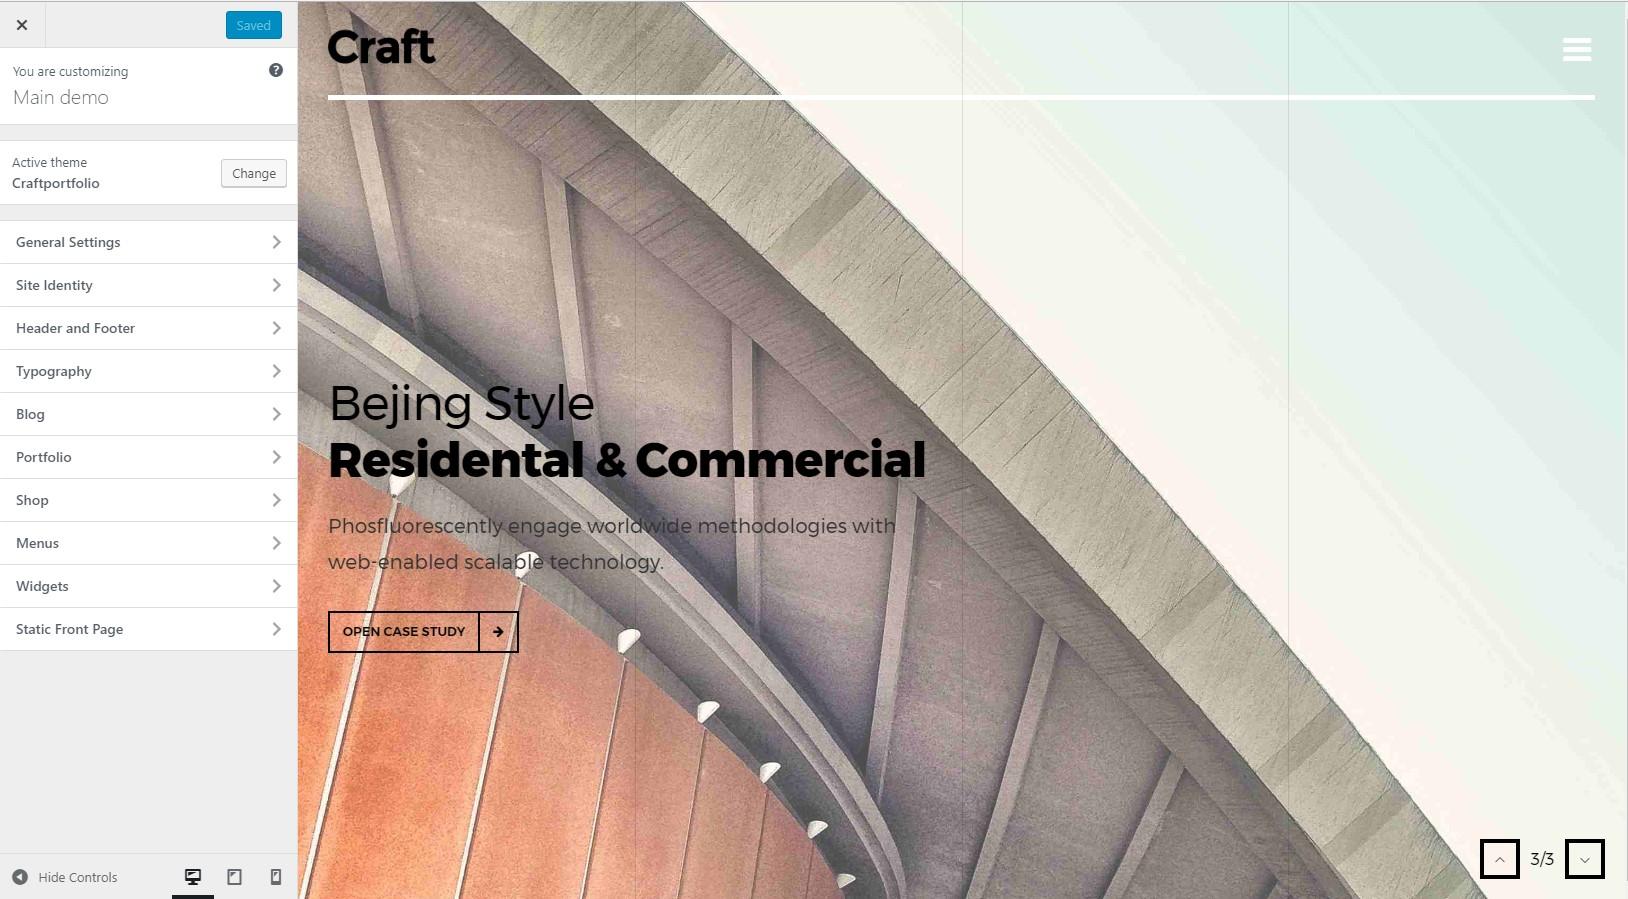 https://documentation.bold-themes.com/craft-portfolio/wp-content/uploads/sites/24/2017/09/customization.jpg